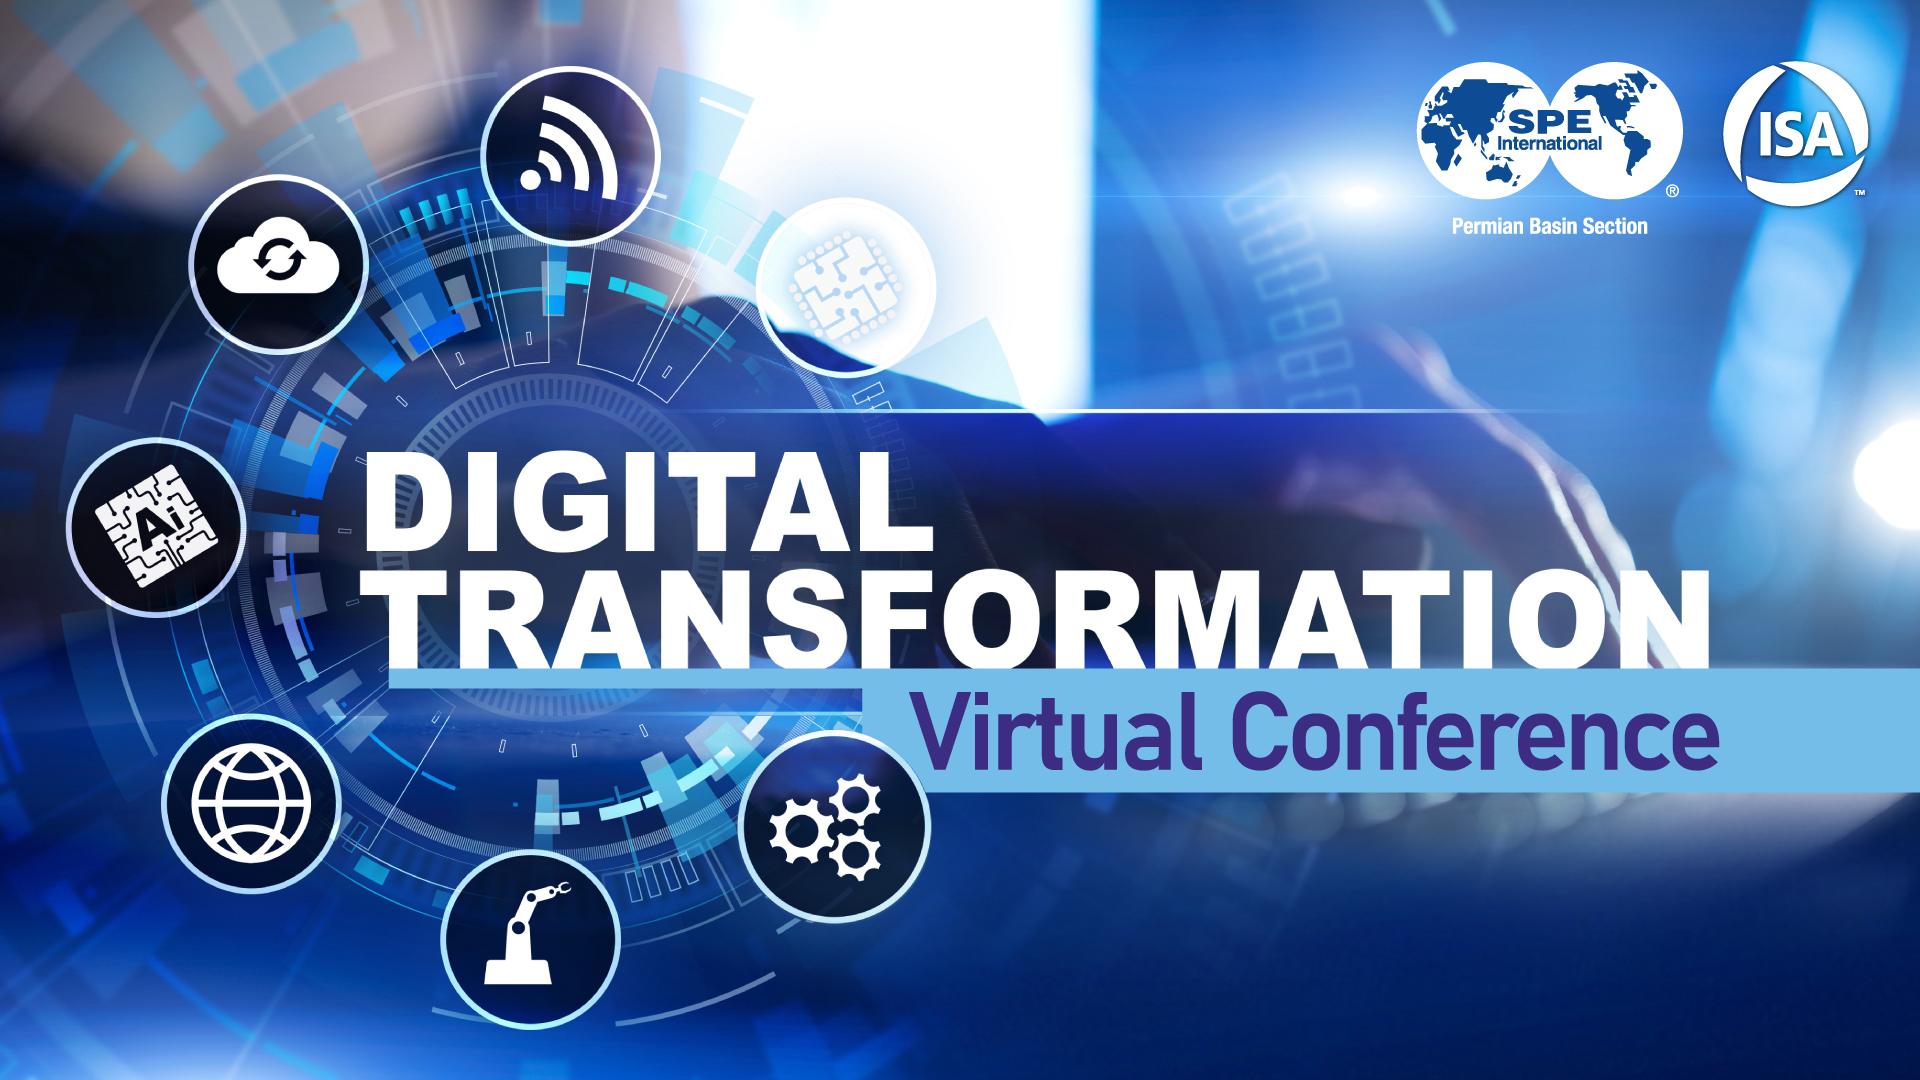 Digital-Transformation-HEROimage_1920x1080_revise